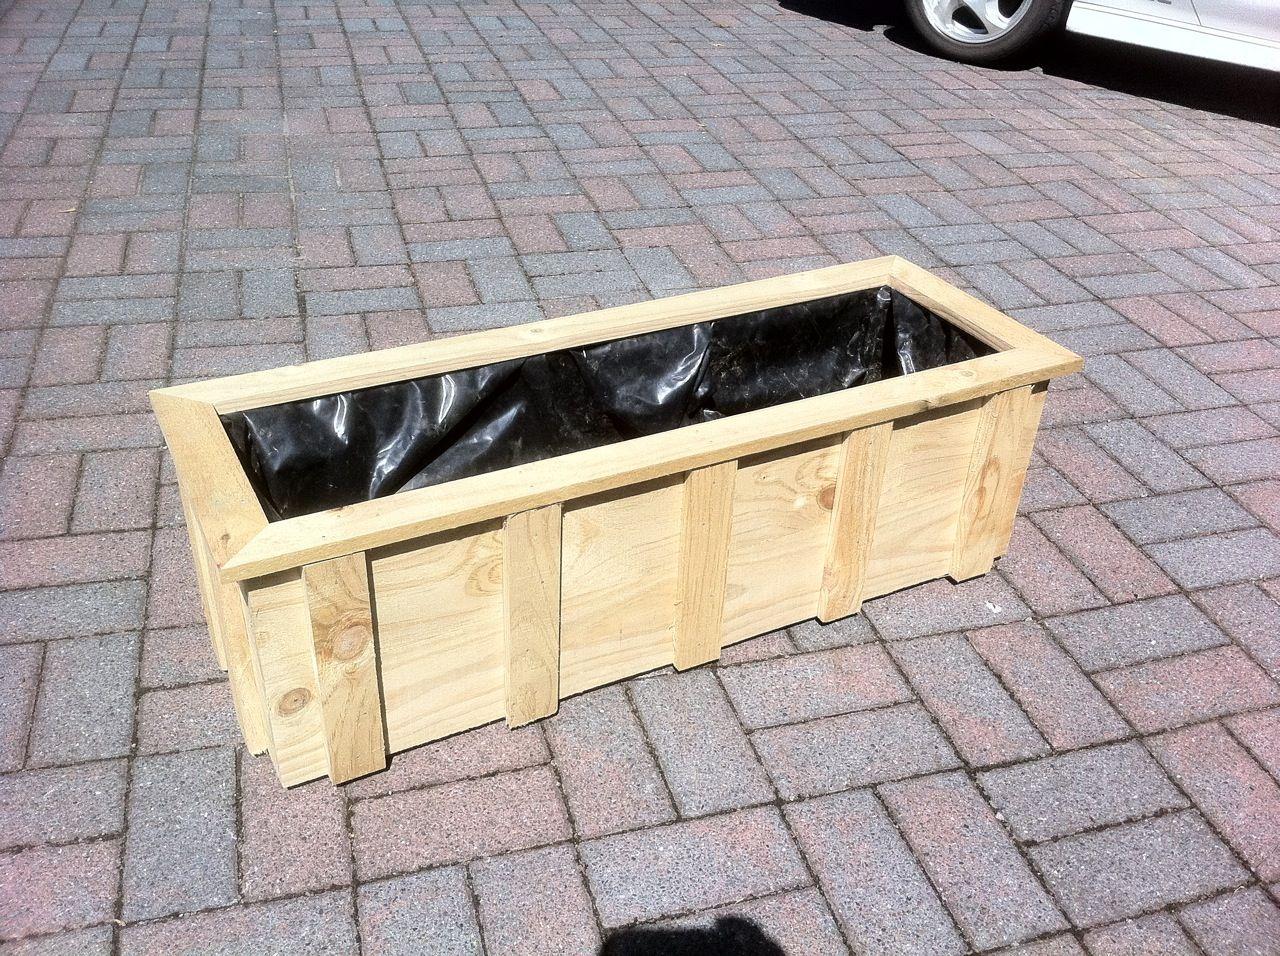 Long Deck Planter Deck Planters Build Outdoor Furniture Diy Planter Box